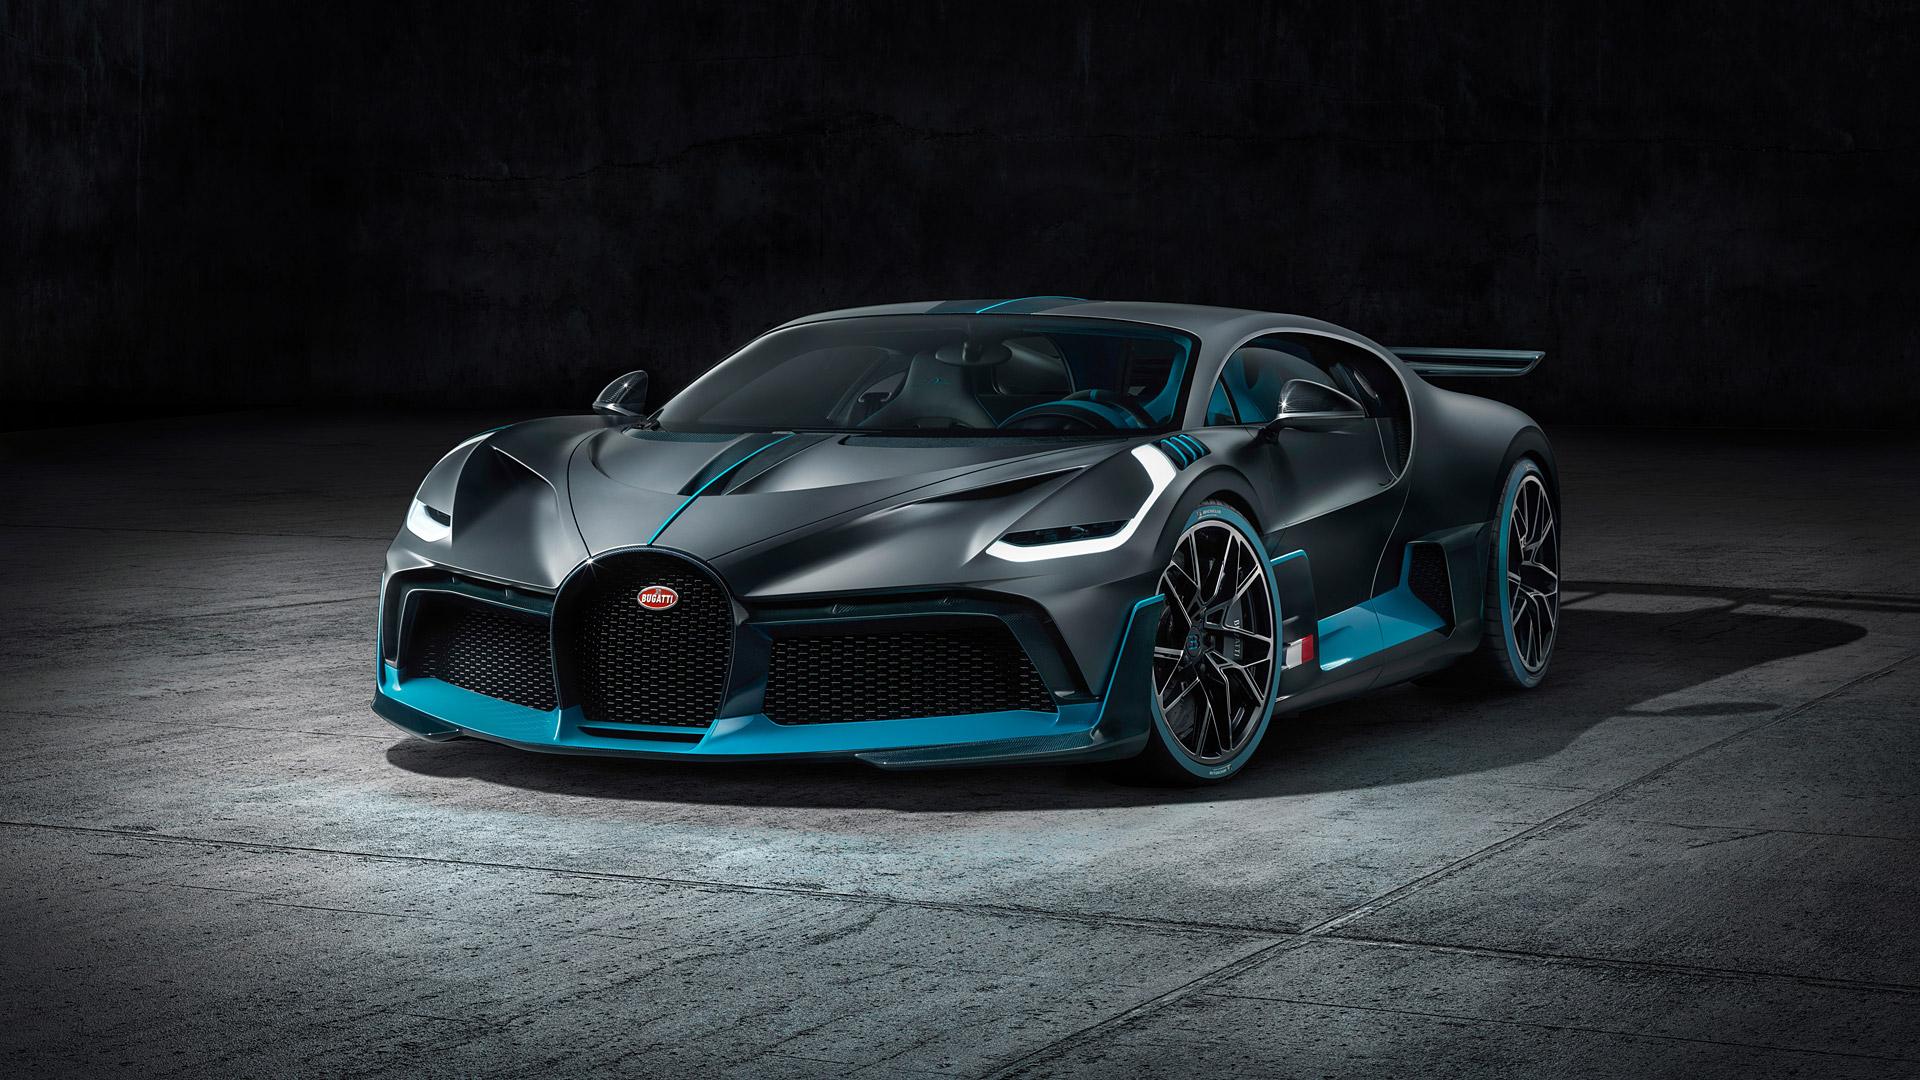 bugatti car wallpaper,land vehicle,vehicle,car,automotive design,supercar